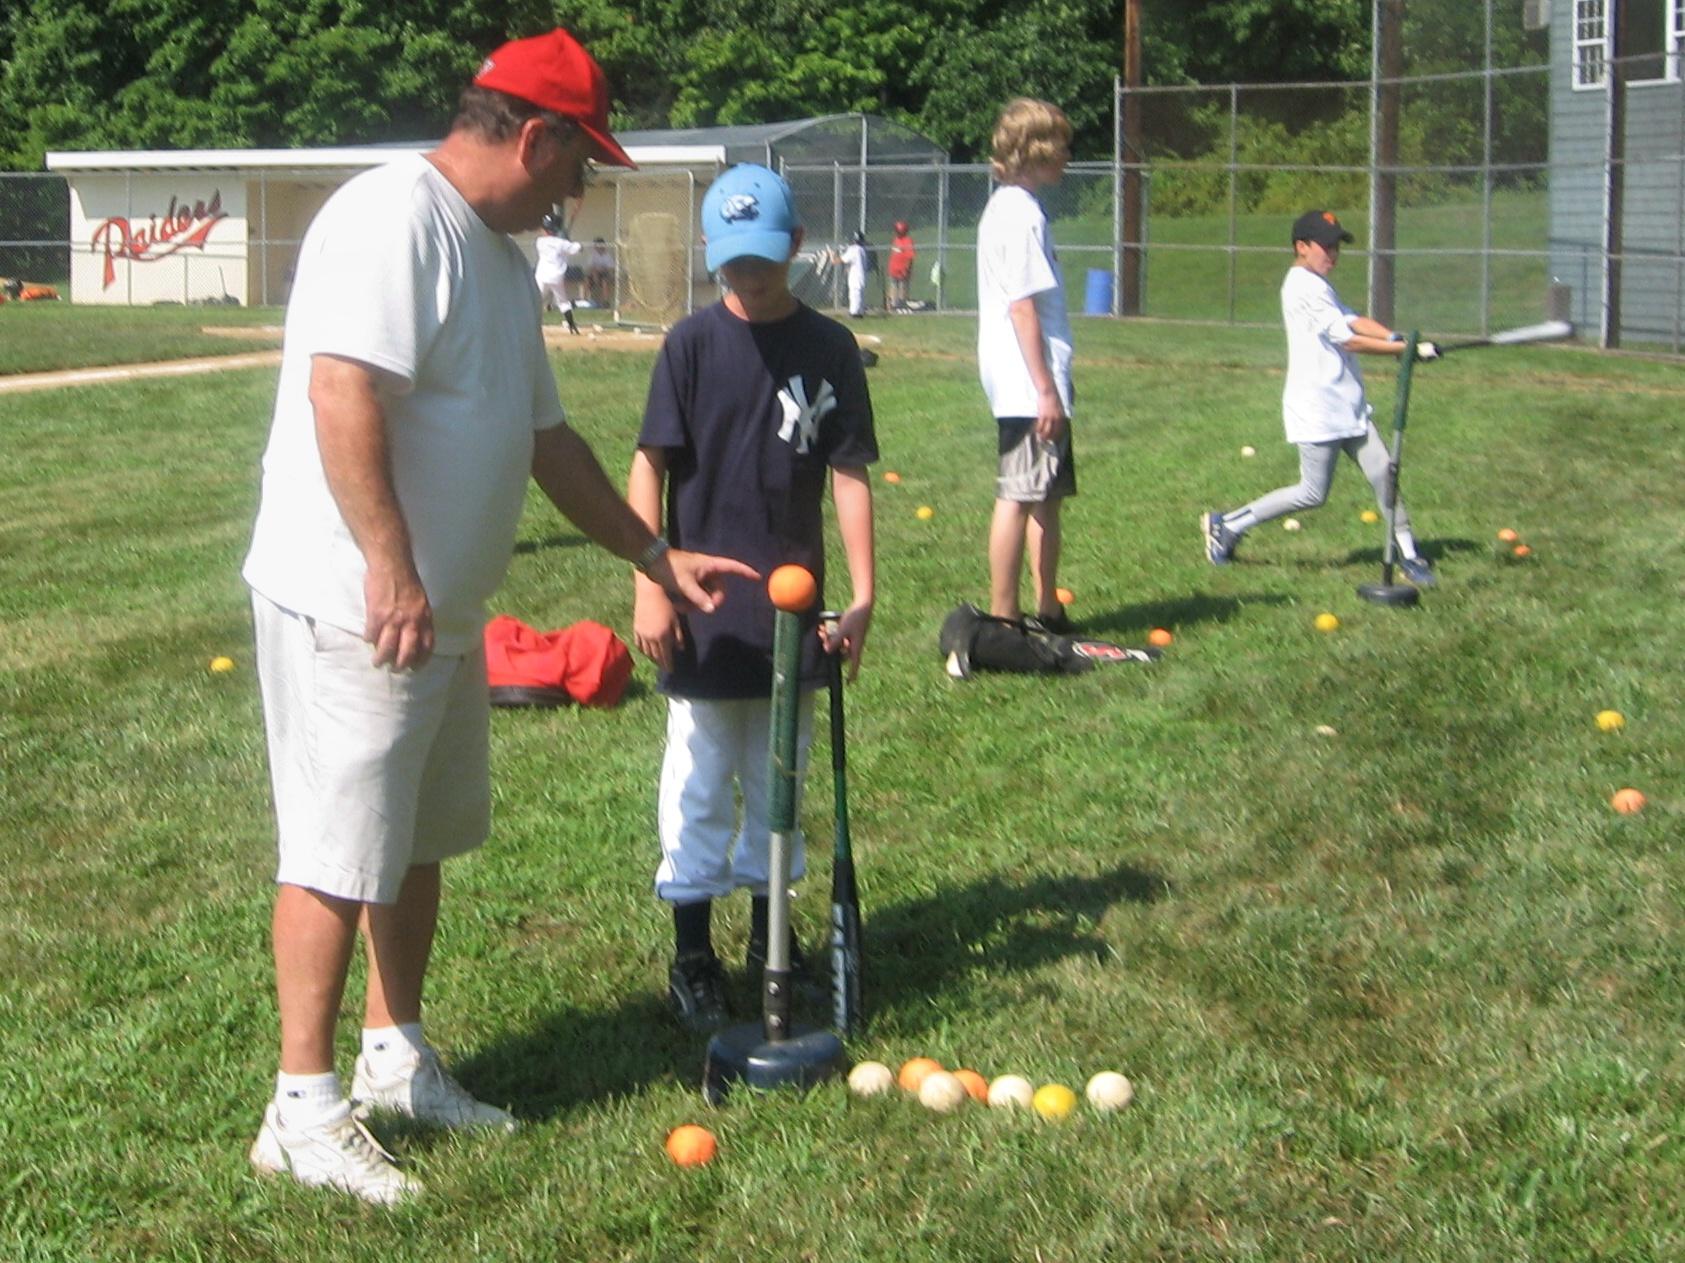 Summer Program - Baseball   The Hun School of Princeton Baseball Camps